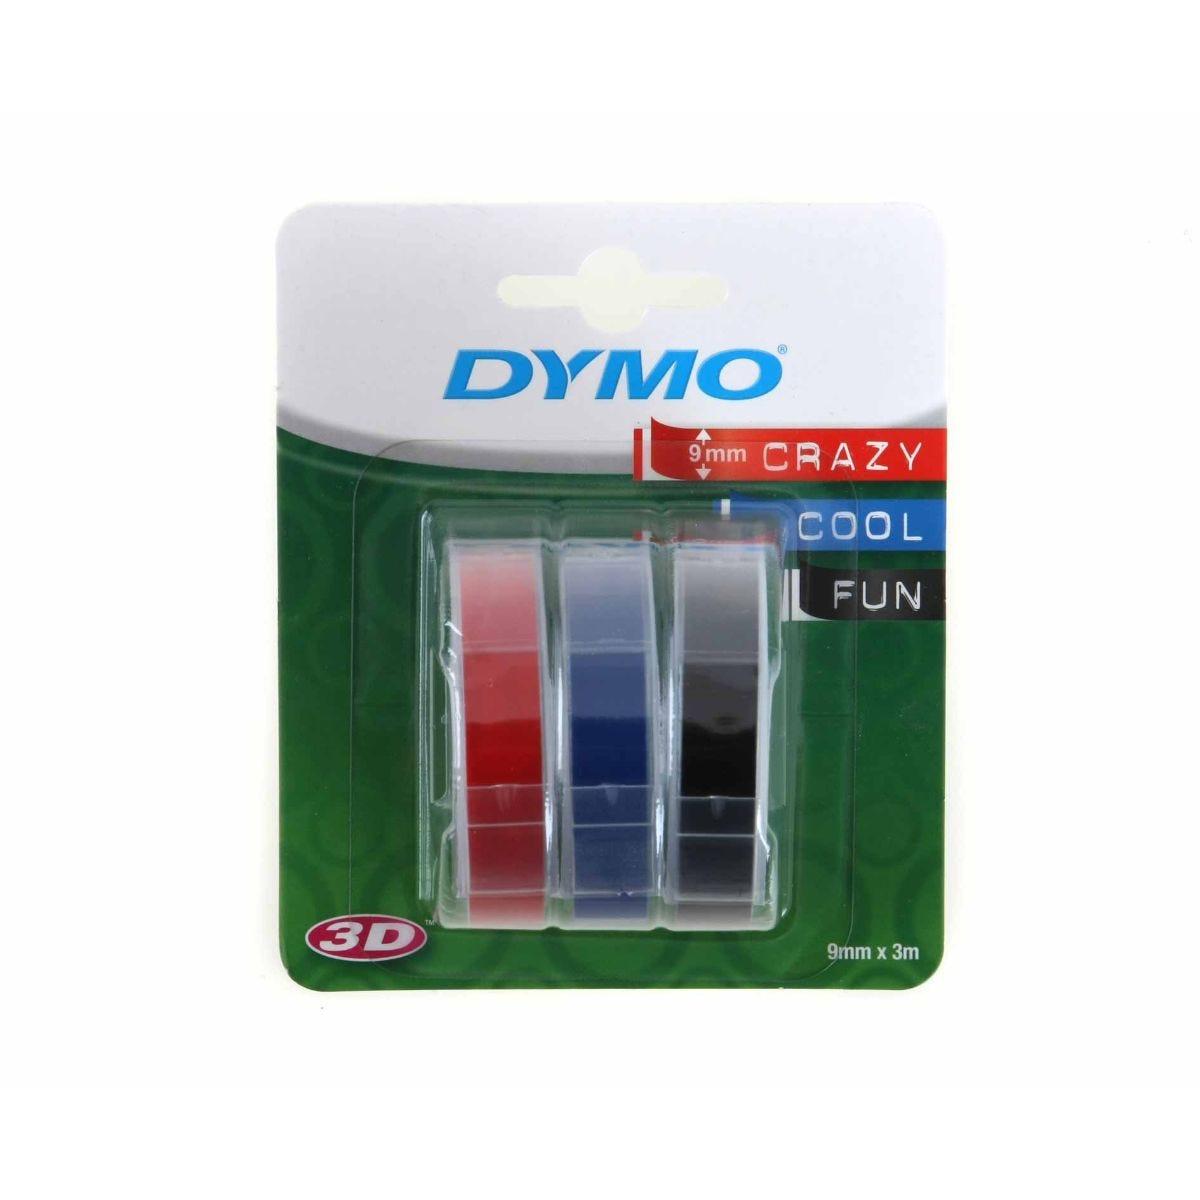 Dymo Embossing Tape 9mm x 3m Pack of 3